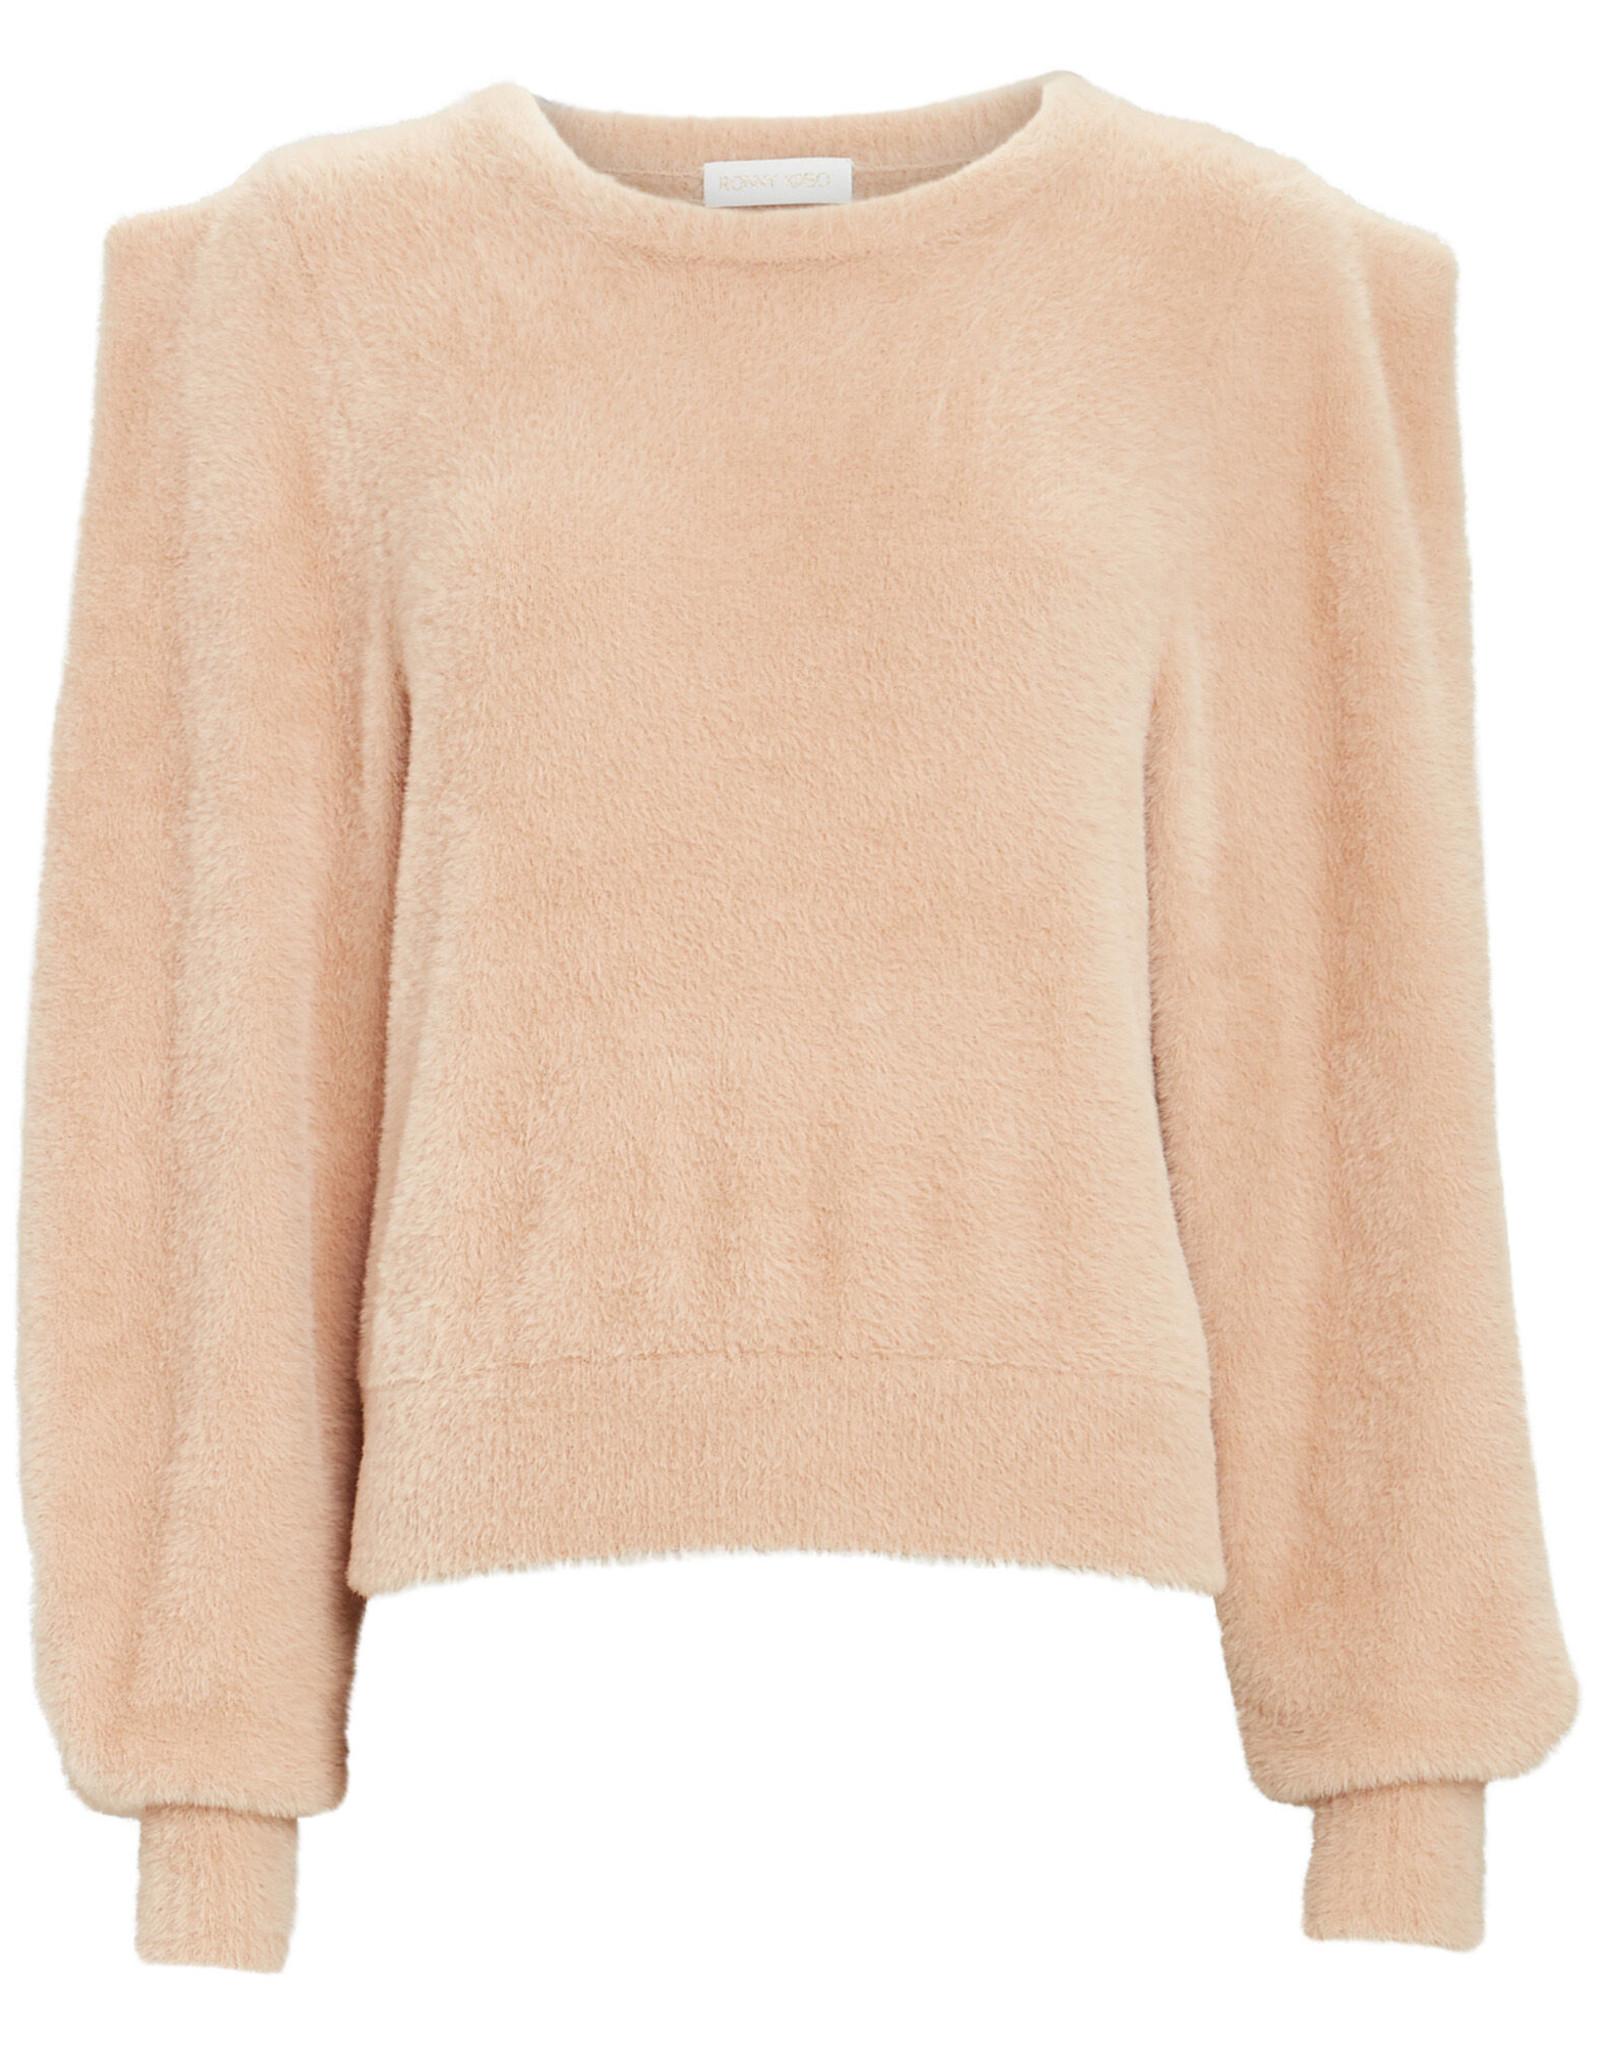 Ronny Kobo Carina Sweater Sand